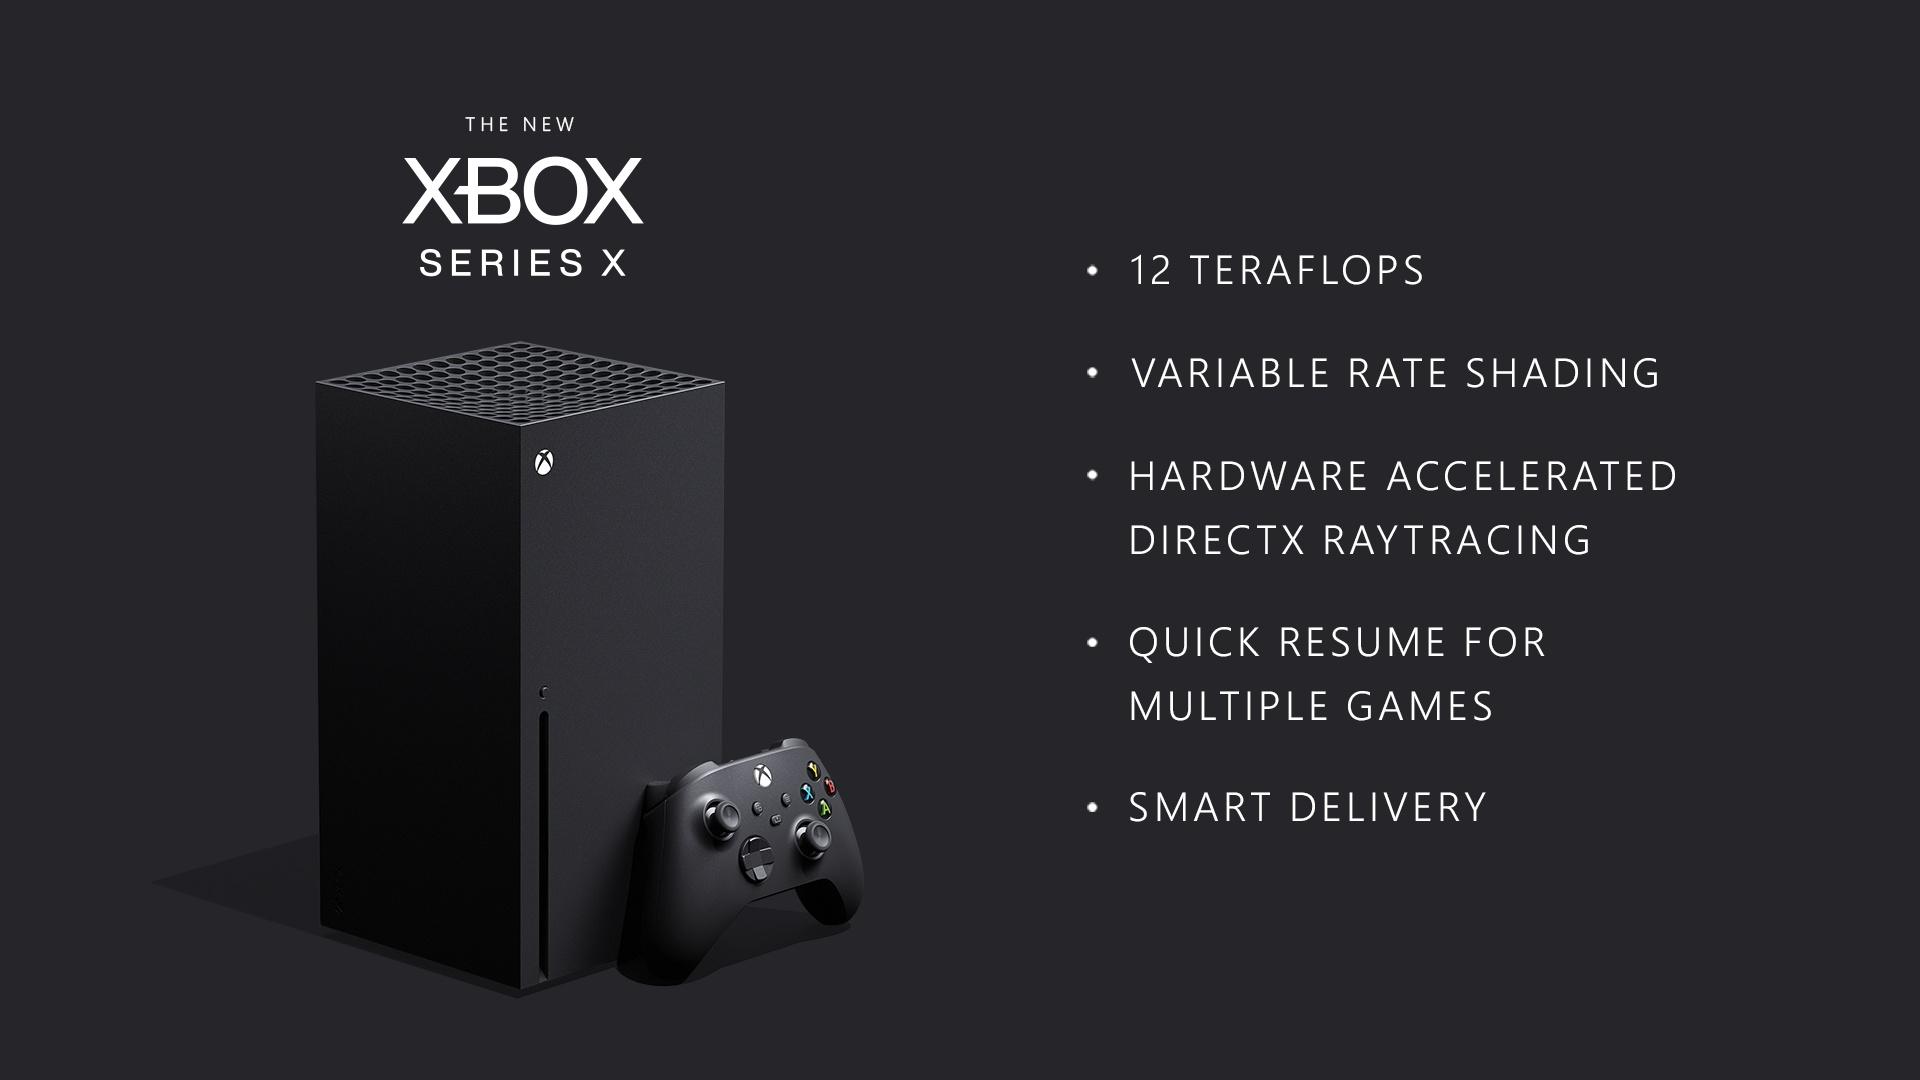 Xbox_ShortBullets_JPG.jpg?w=1920